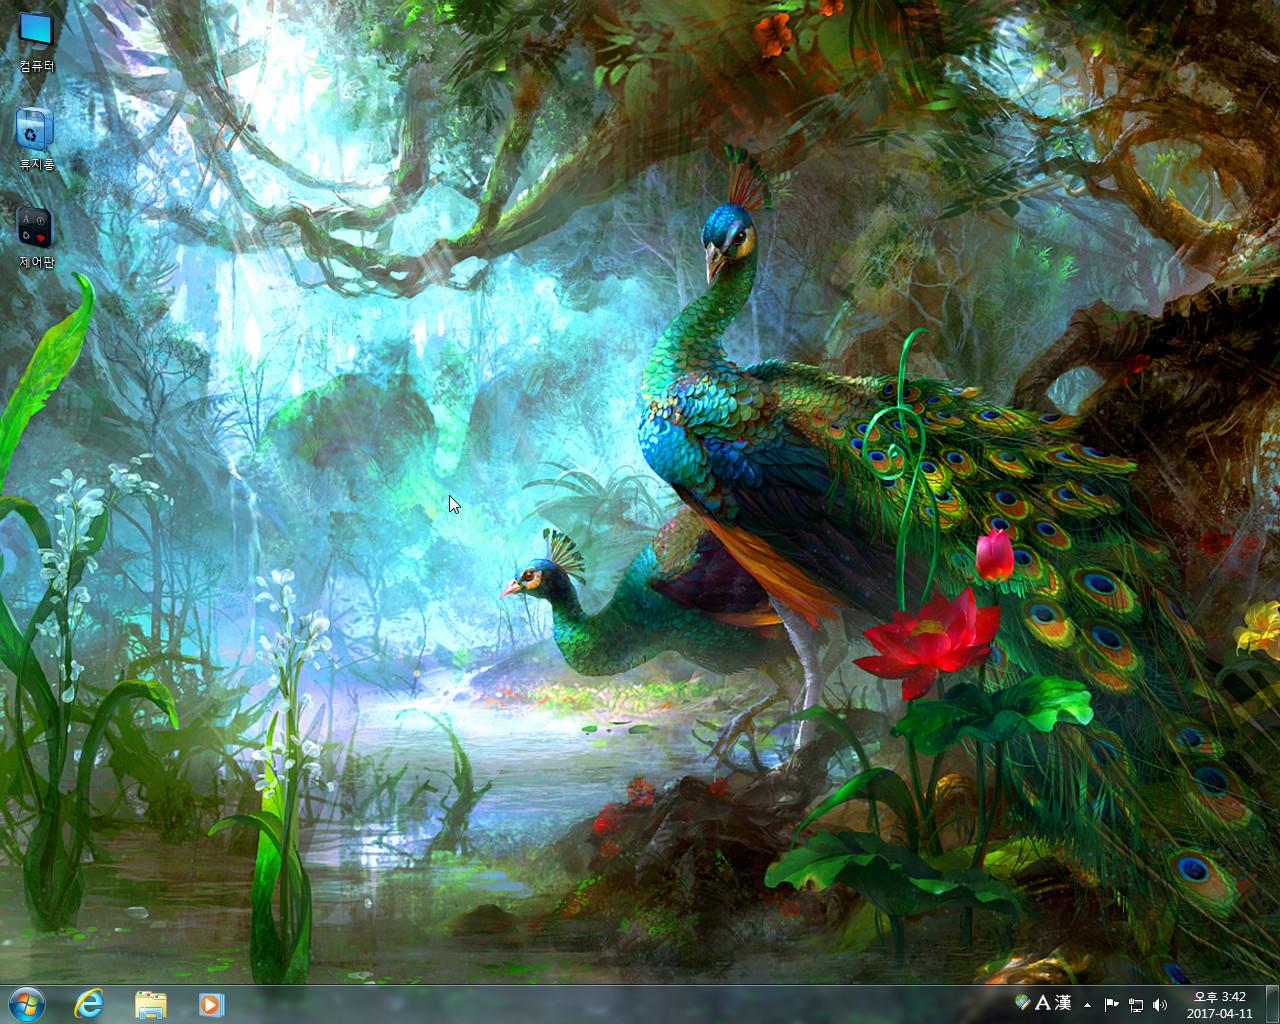 Windows 7 Ultimate_x64_Lite_KO_KY_OldMaC21.jpg